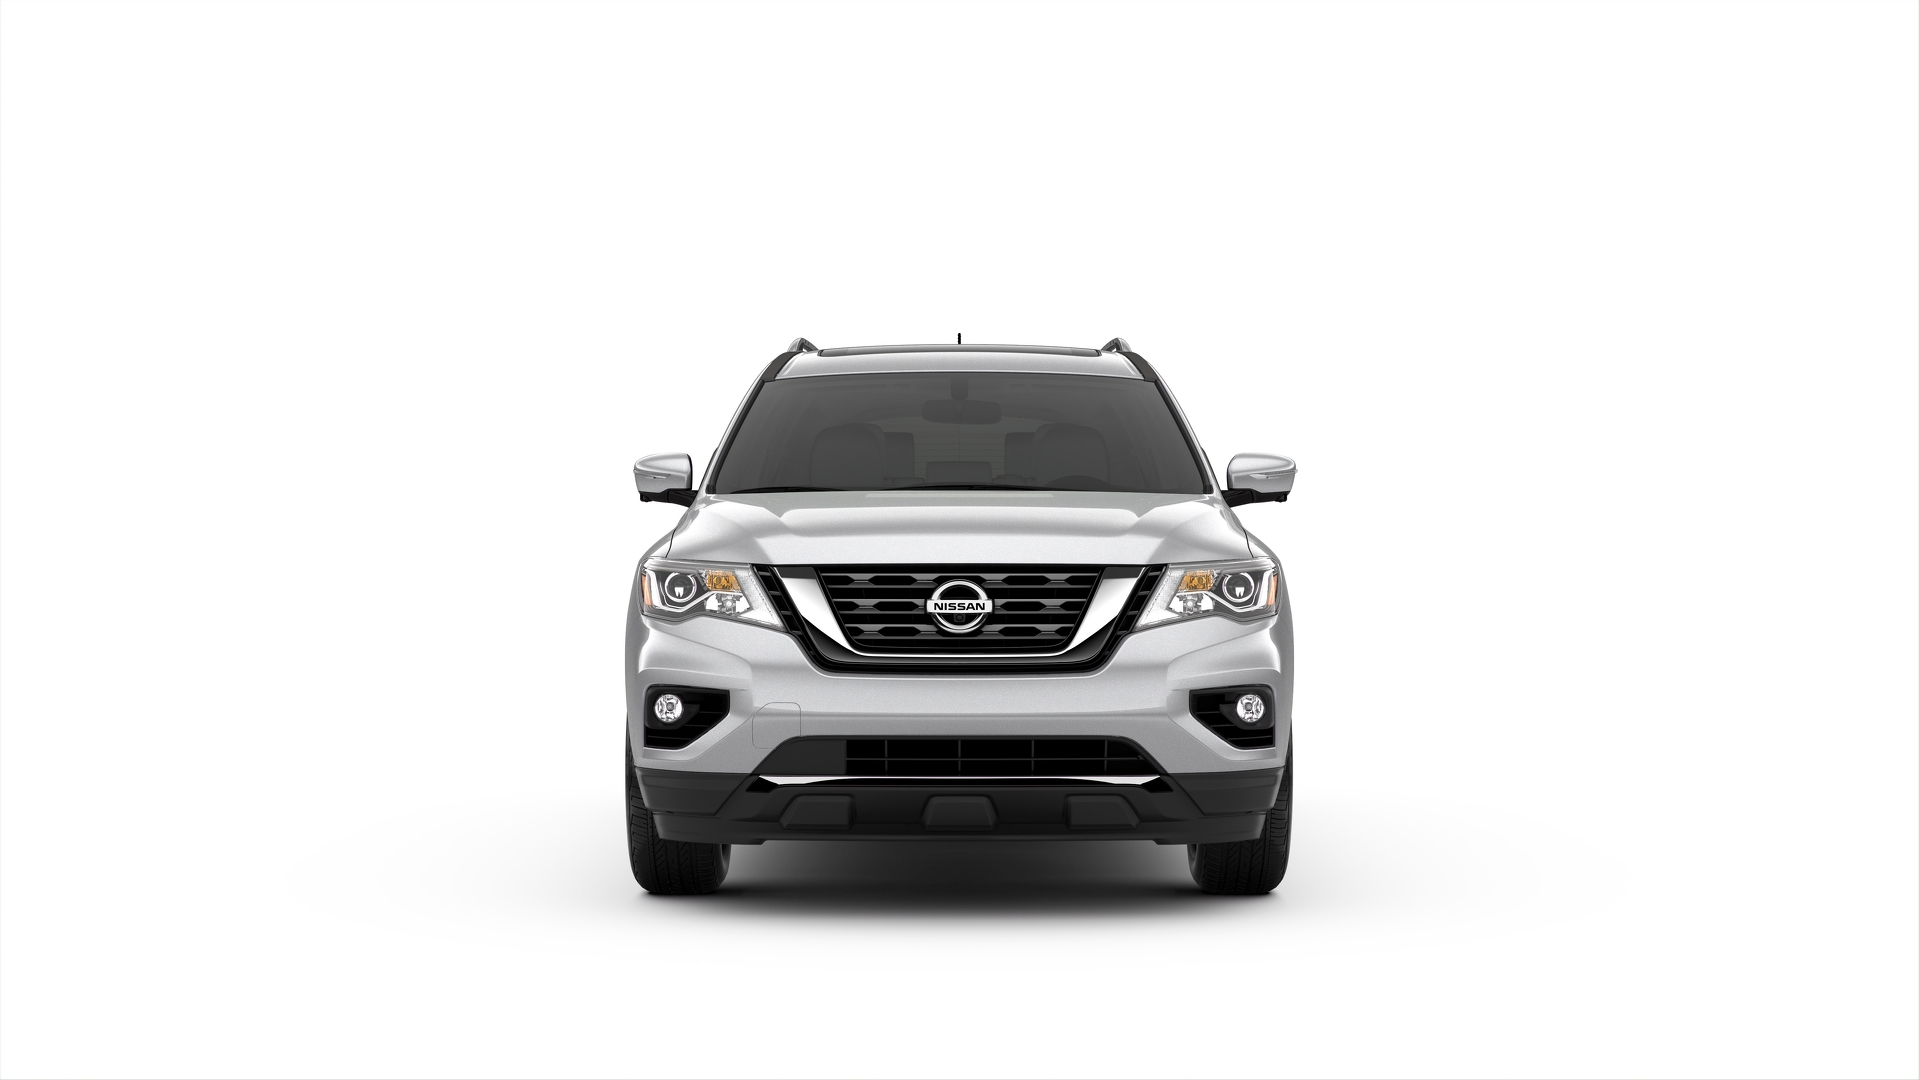 Nissan x-trail 2018 дата продаж в россии